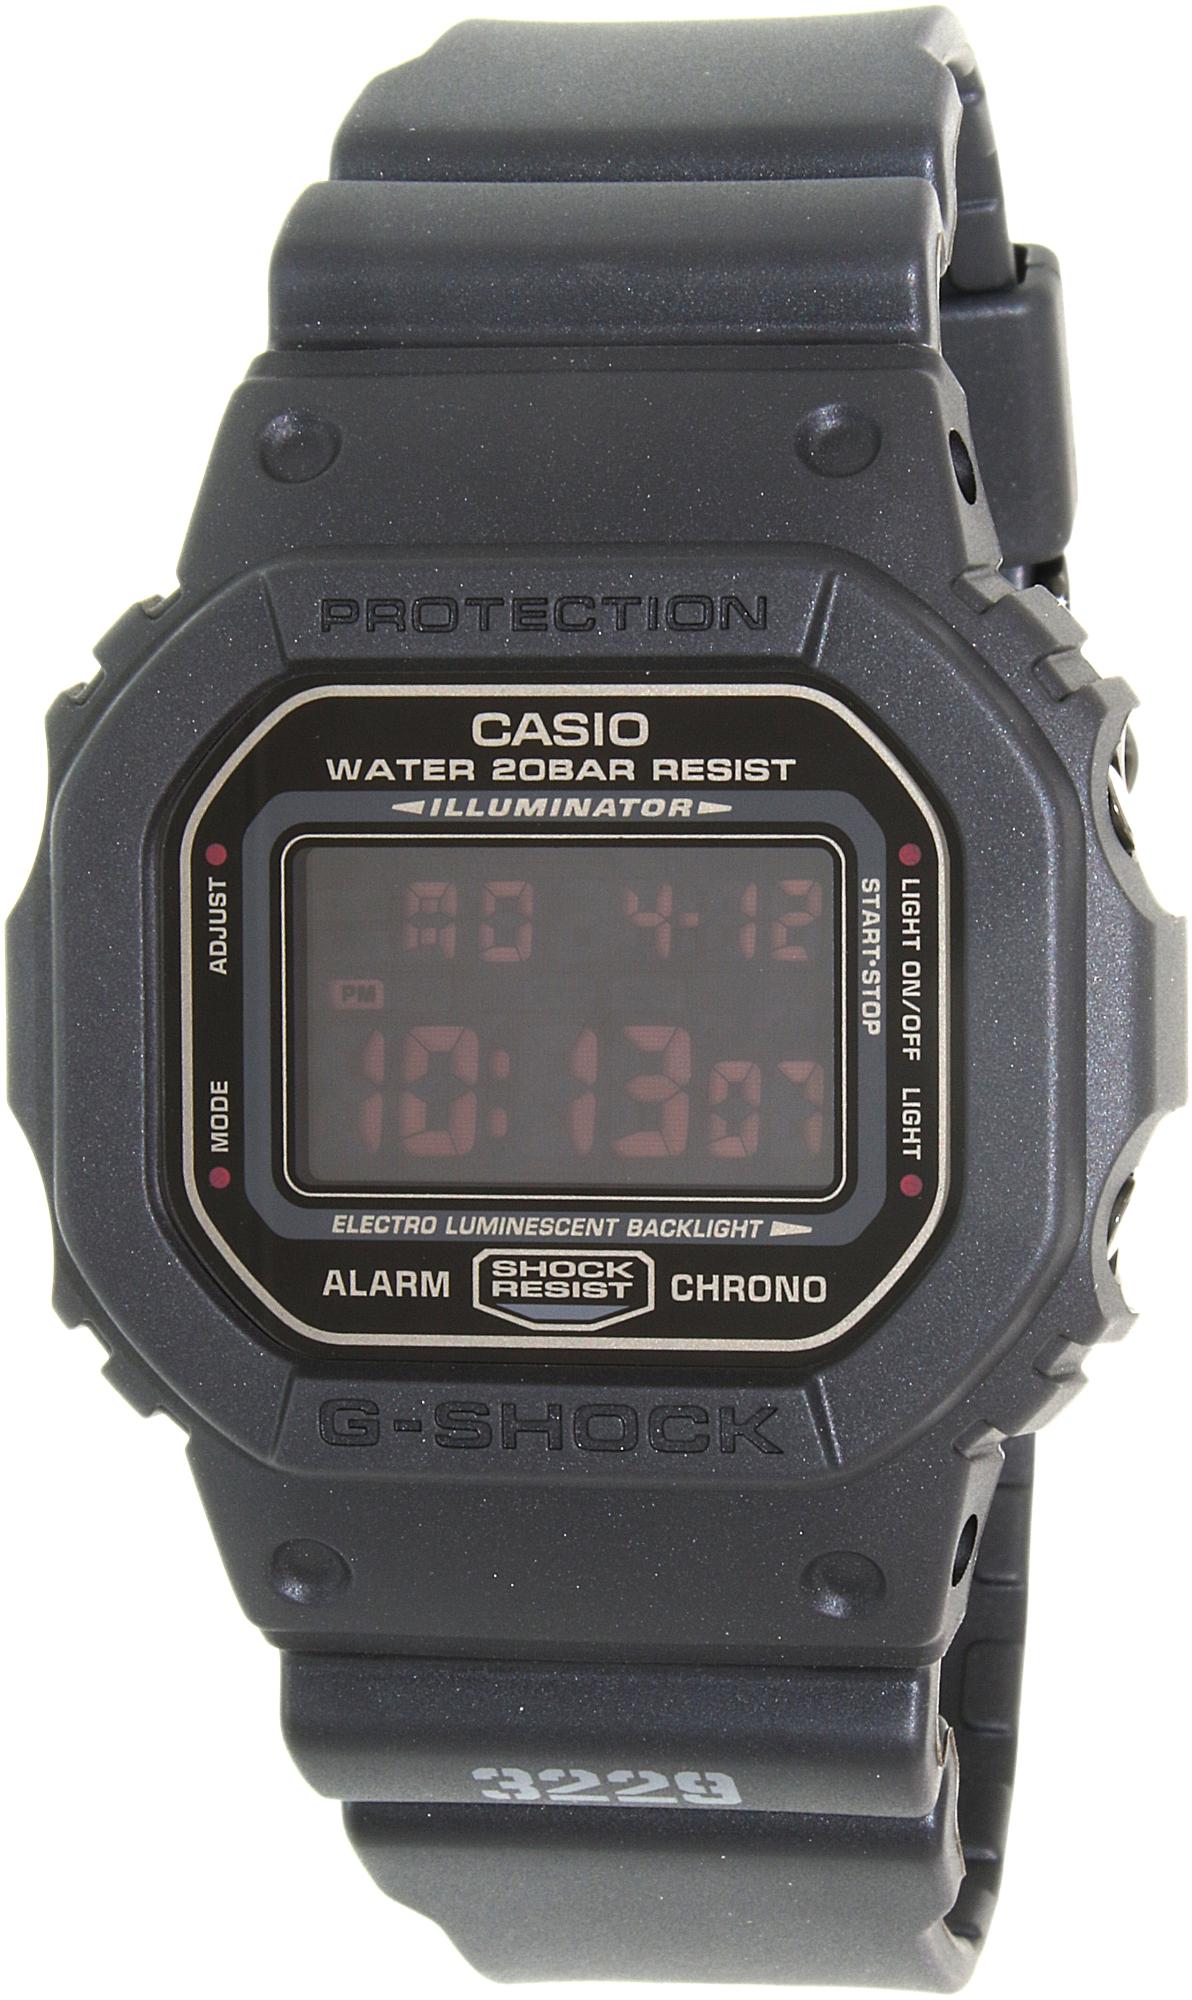 Casio_Mens_GShock_DW5600MS1_Black_Resin_Quartz_Sport_Watch